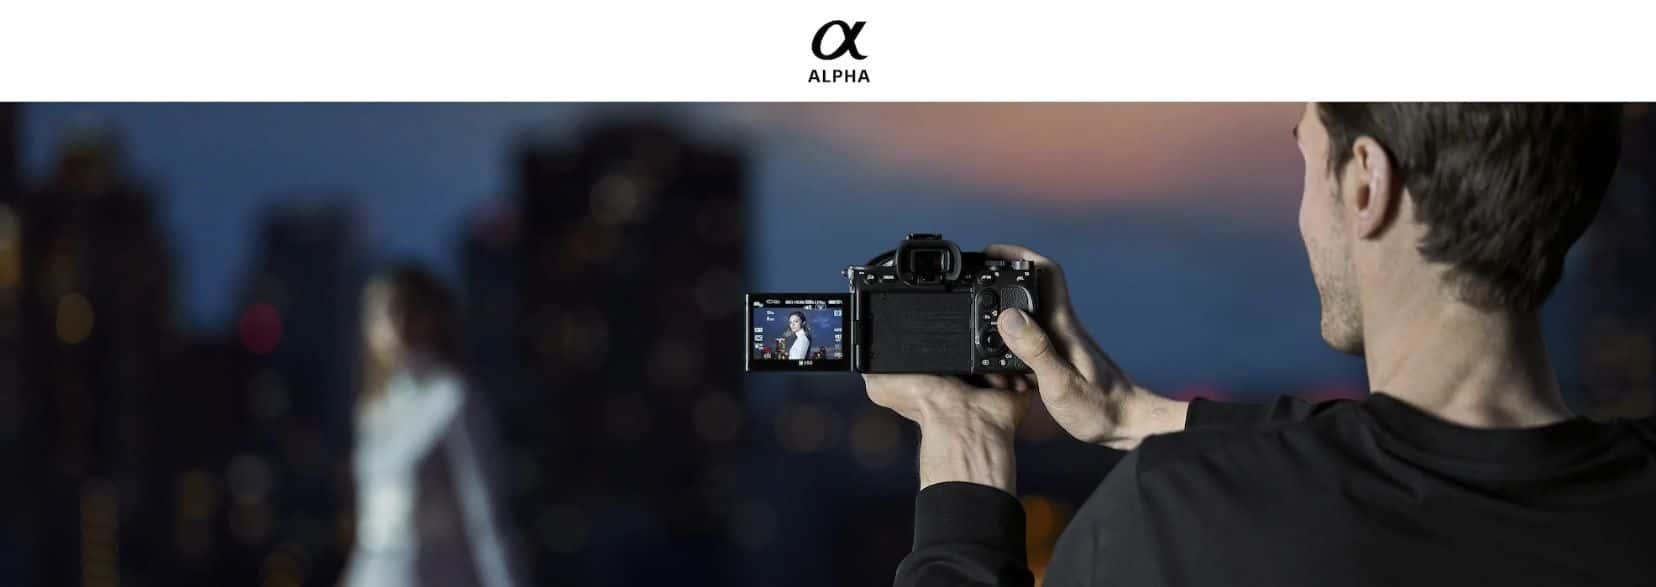 Sony Alpha 7S III - boîtier nu image 1 | Rakuten